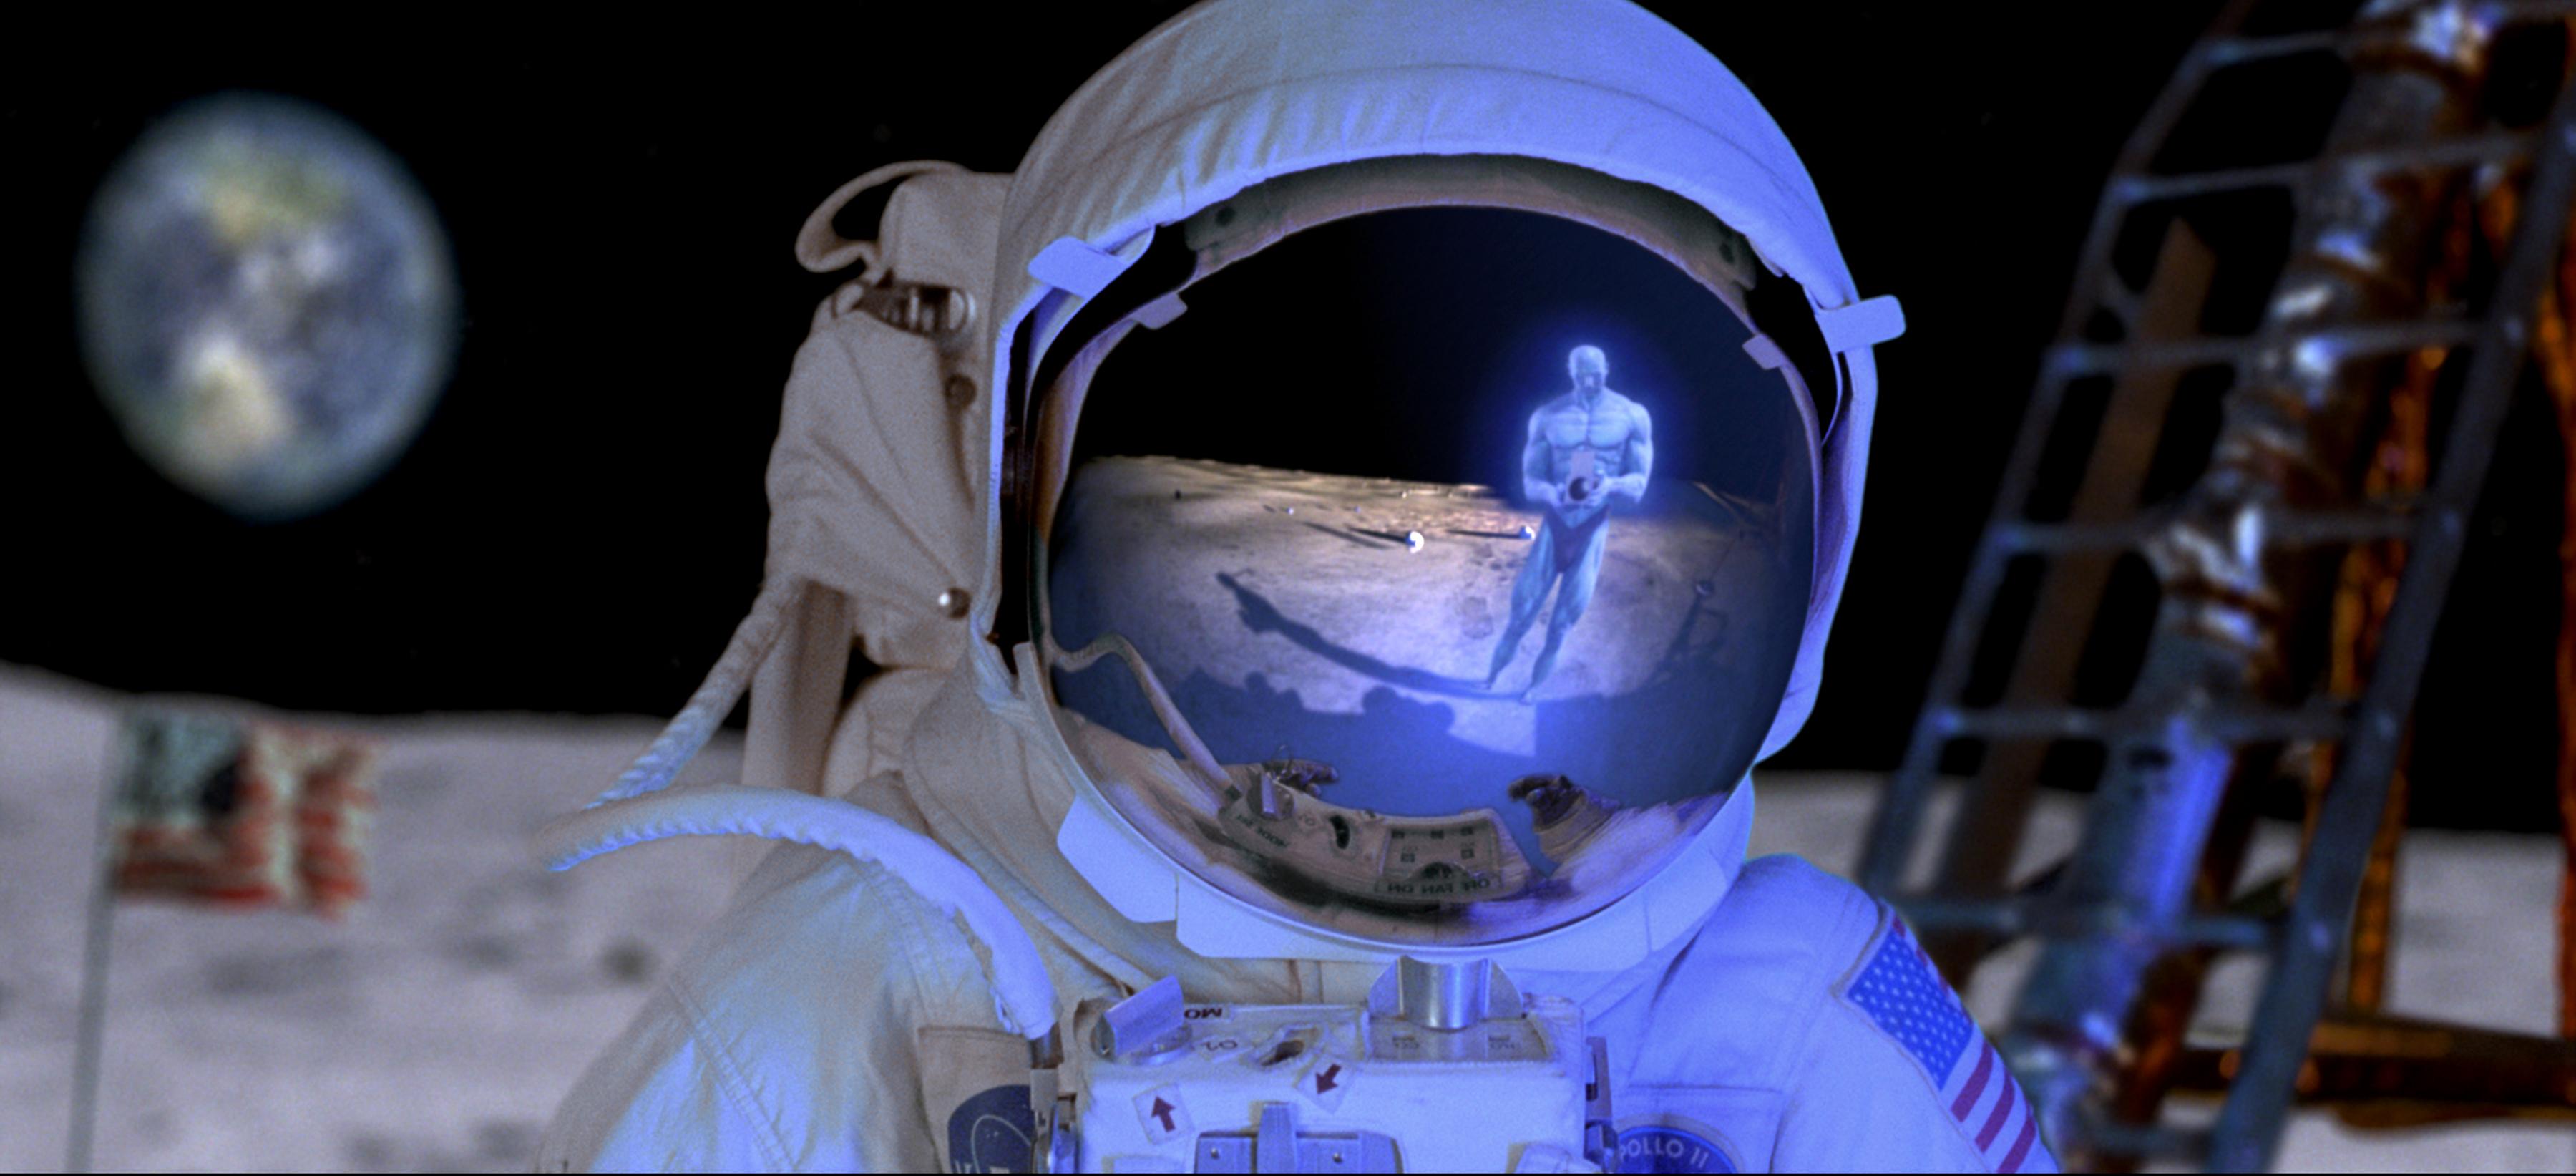 Watchmen movies moon astronauts dr manhattan desktop  X  hd Wallpaper 3600x1643